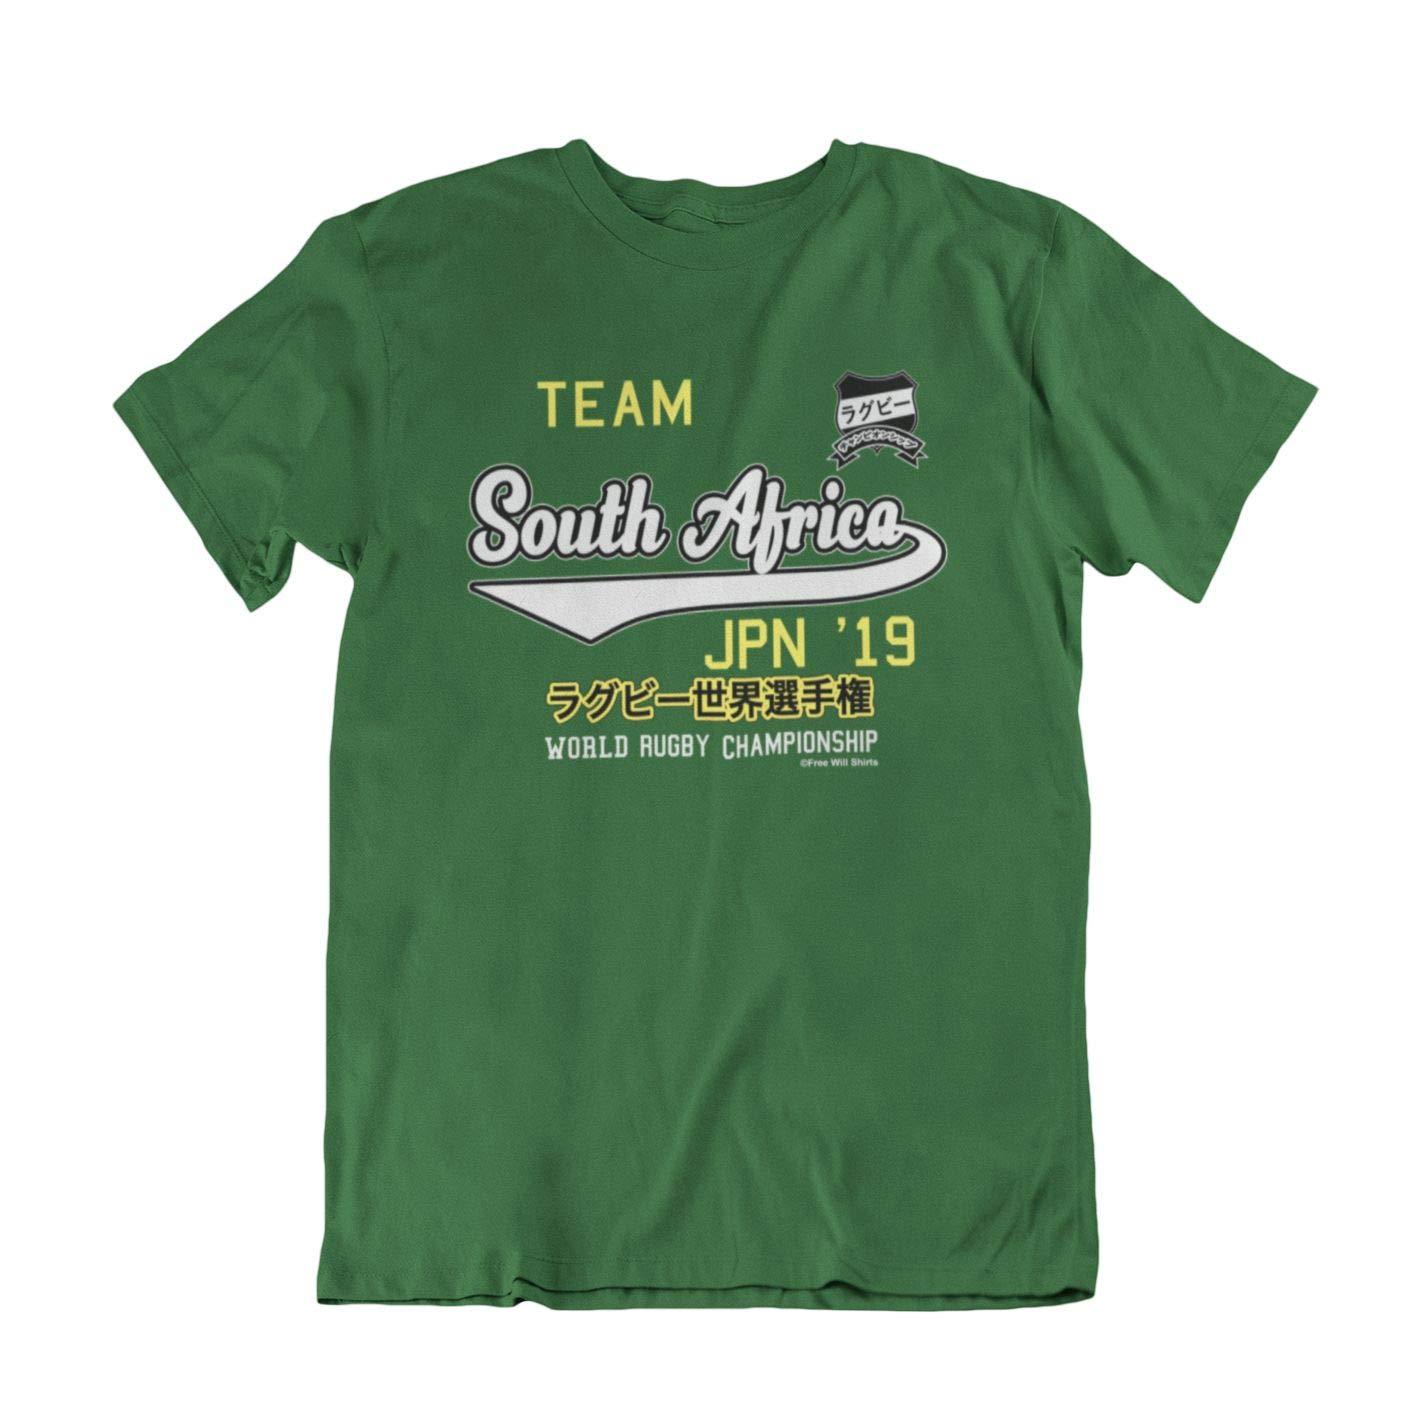 FreeWillShirts Kids Boys Girls World Rugby Championship Japan 2019 T-Shirt Team South Africa